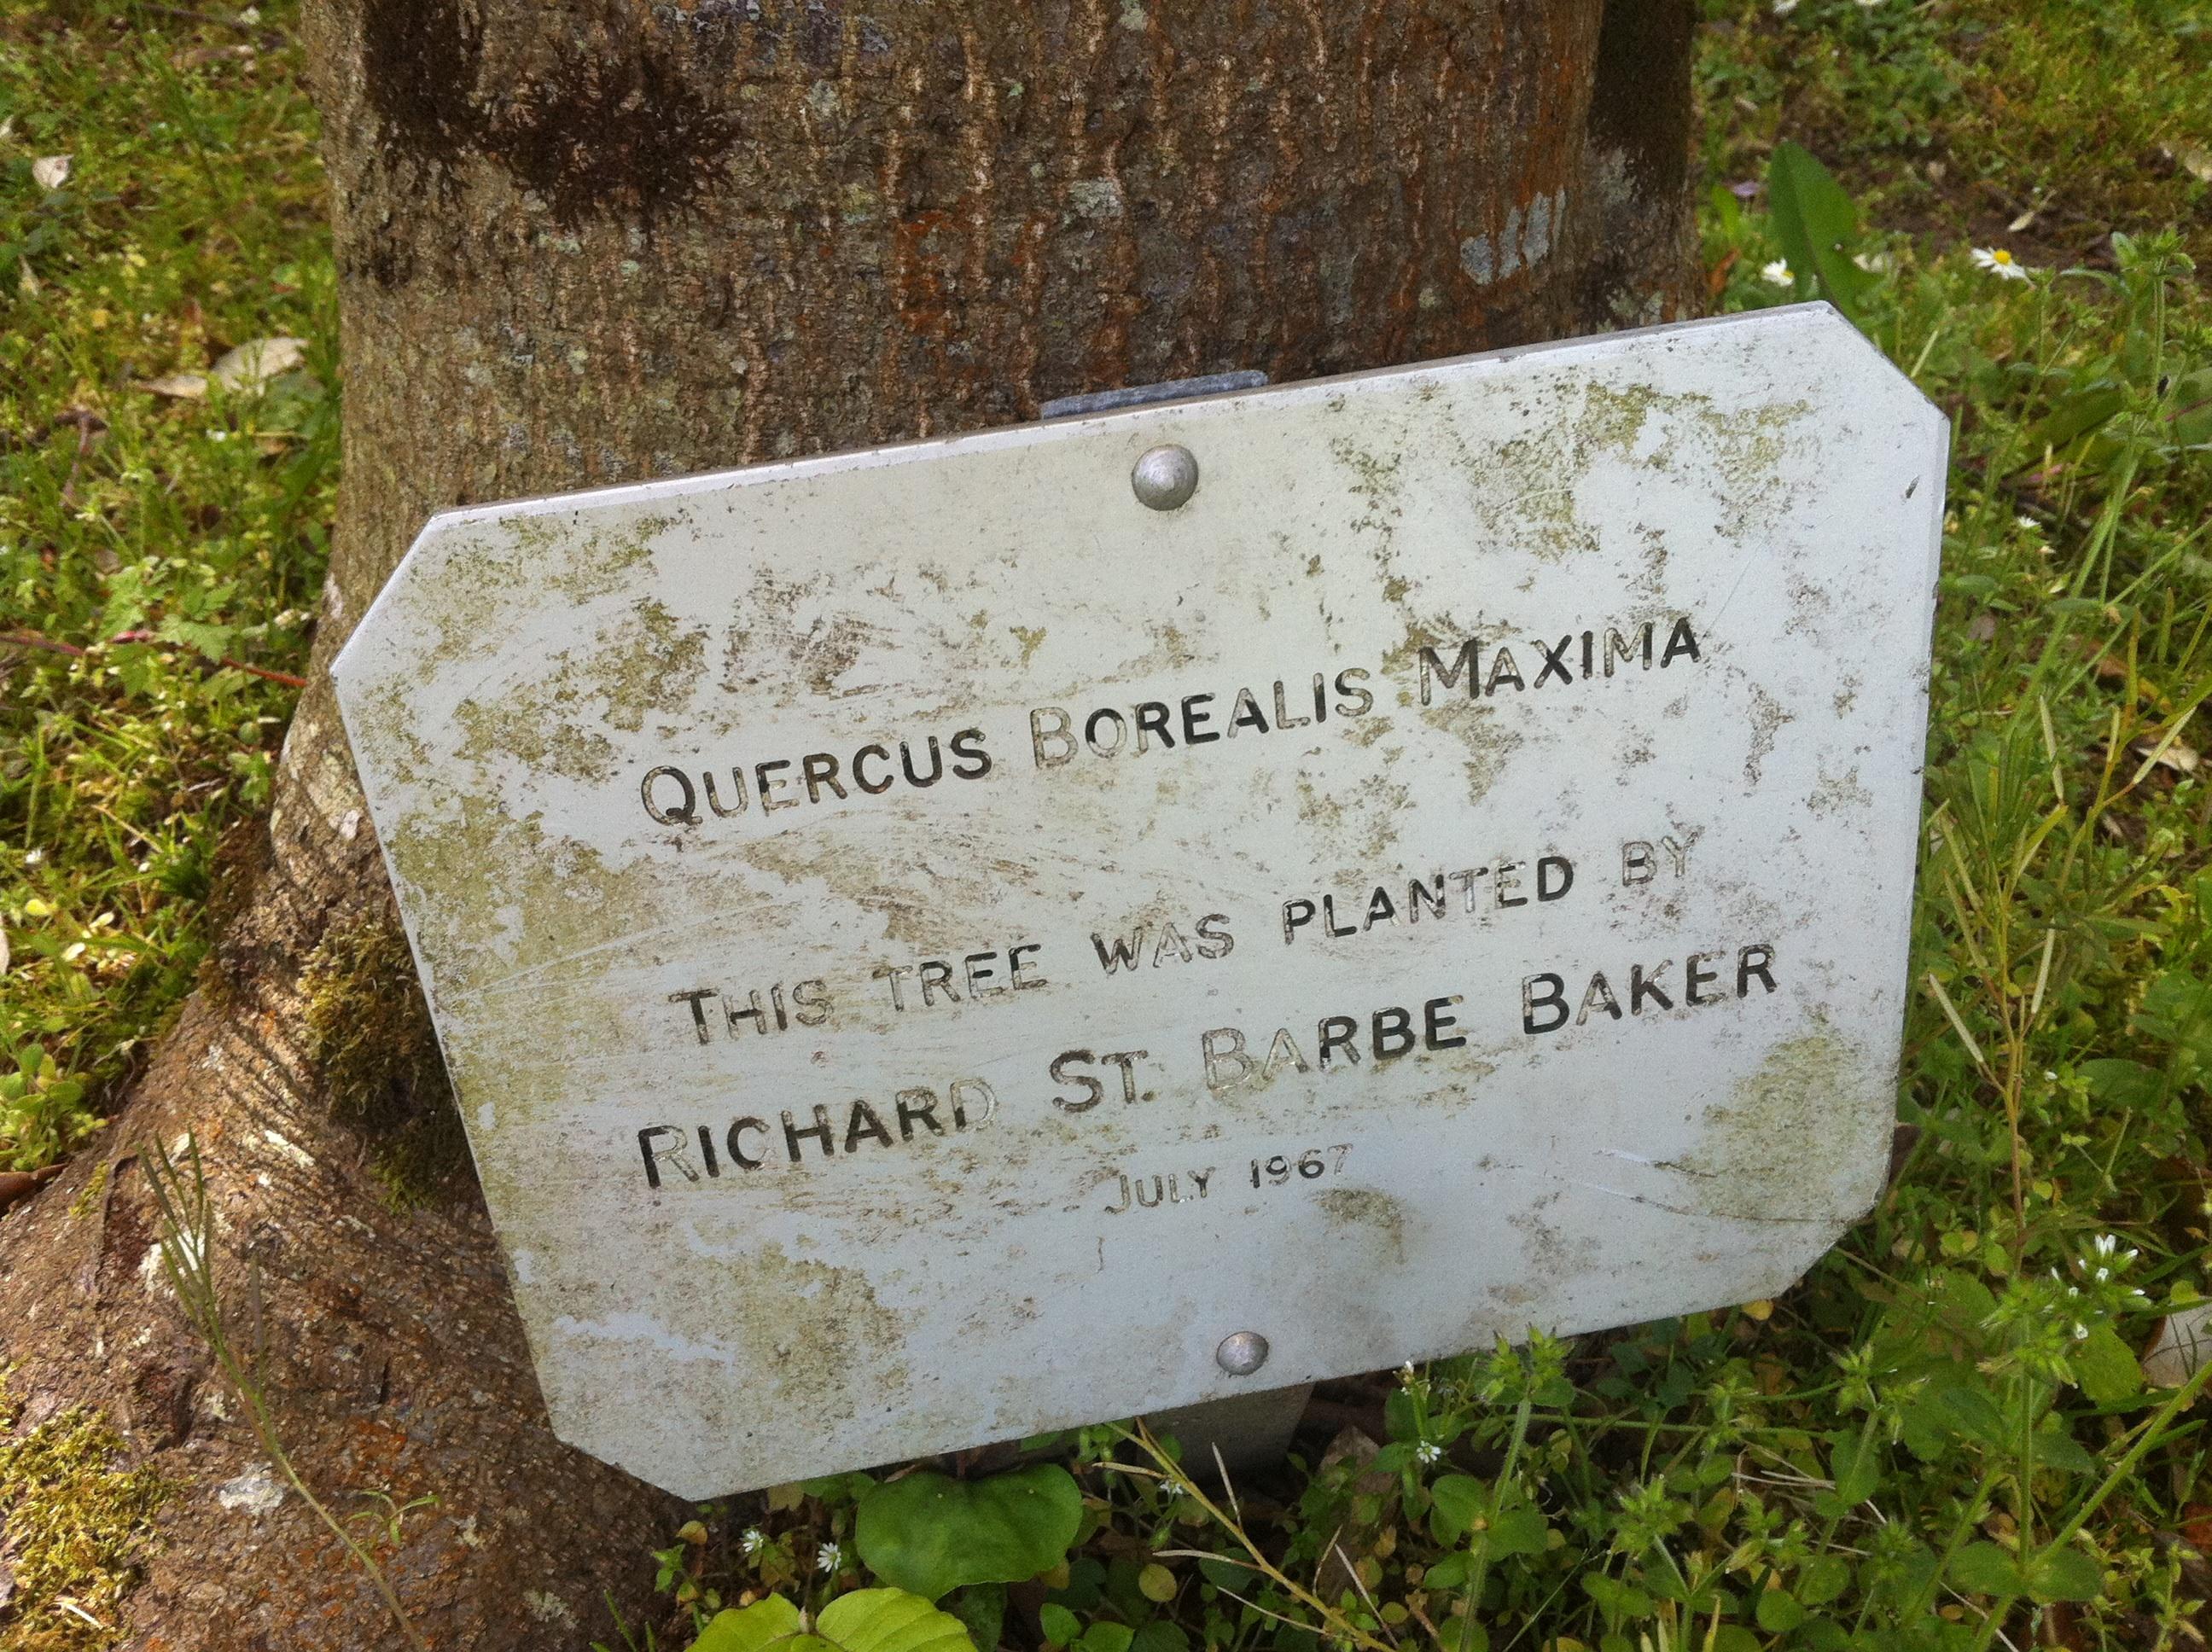 Robert baker forest conservation area